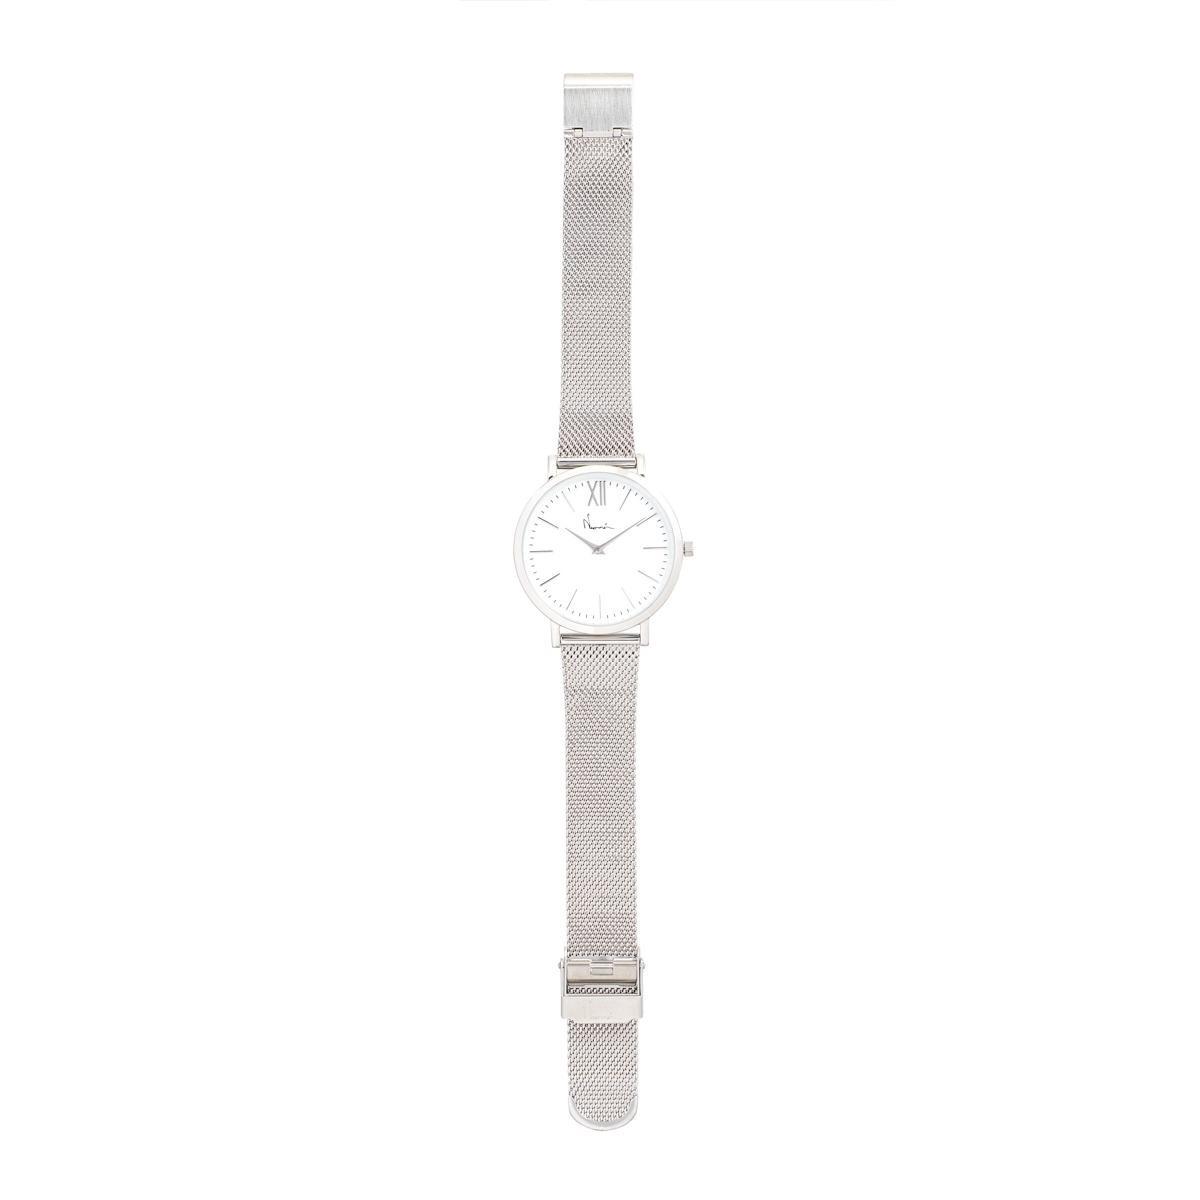 c37bf17a1069 Reloj Naomi Campbell